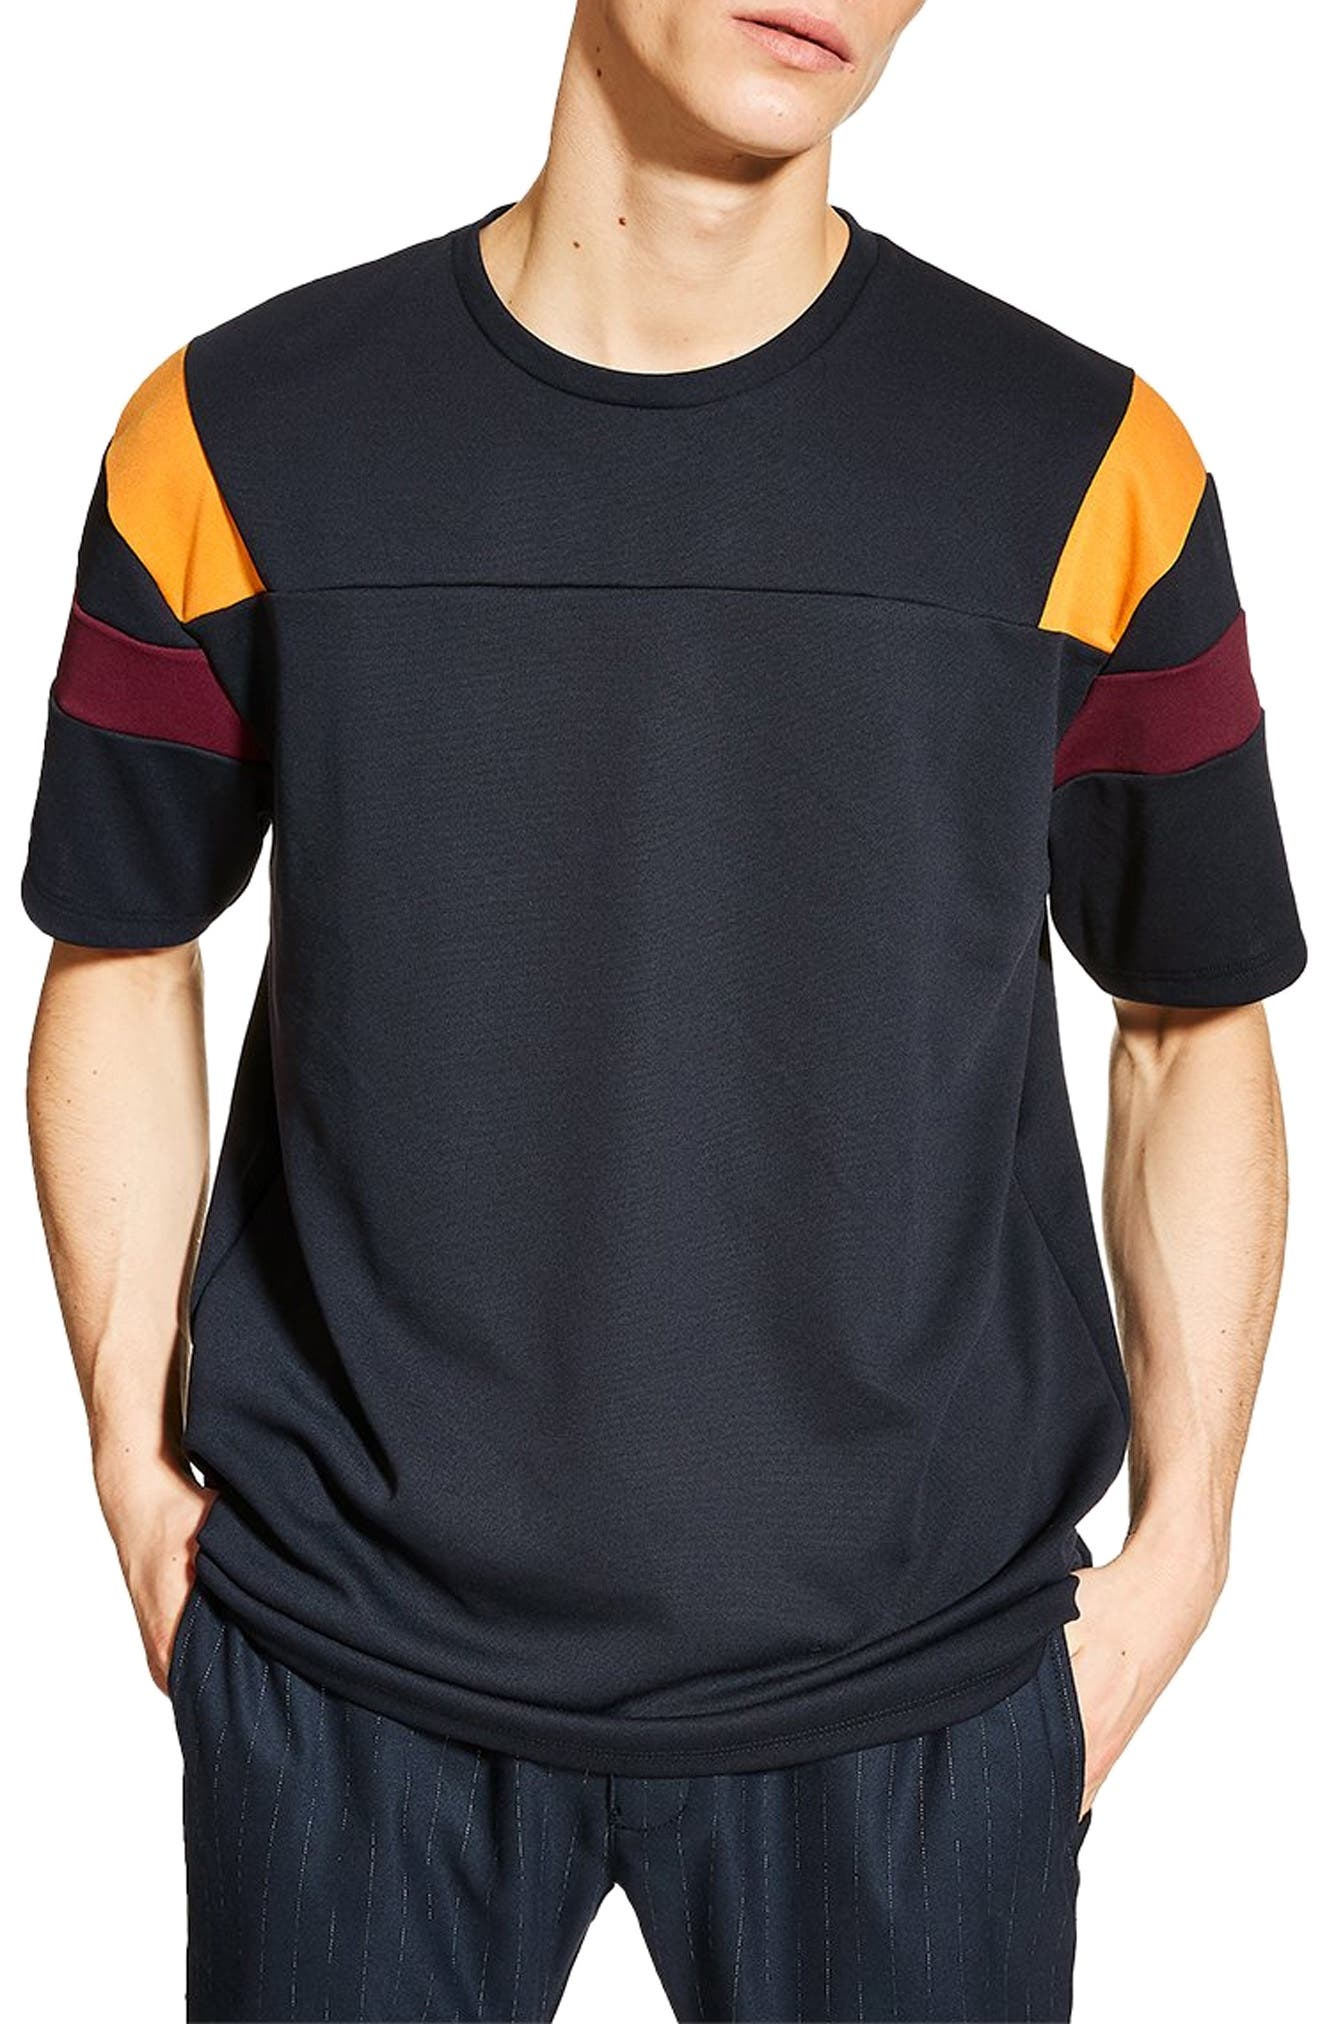 Oversize Panel T-Shirt,                             Main thumbnail 1, color,                             NAVY/ BURGUNDY